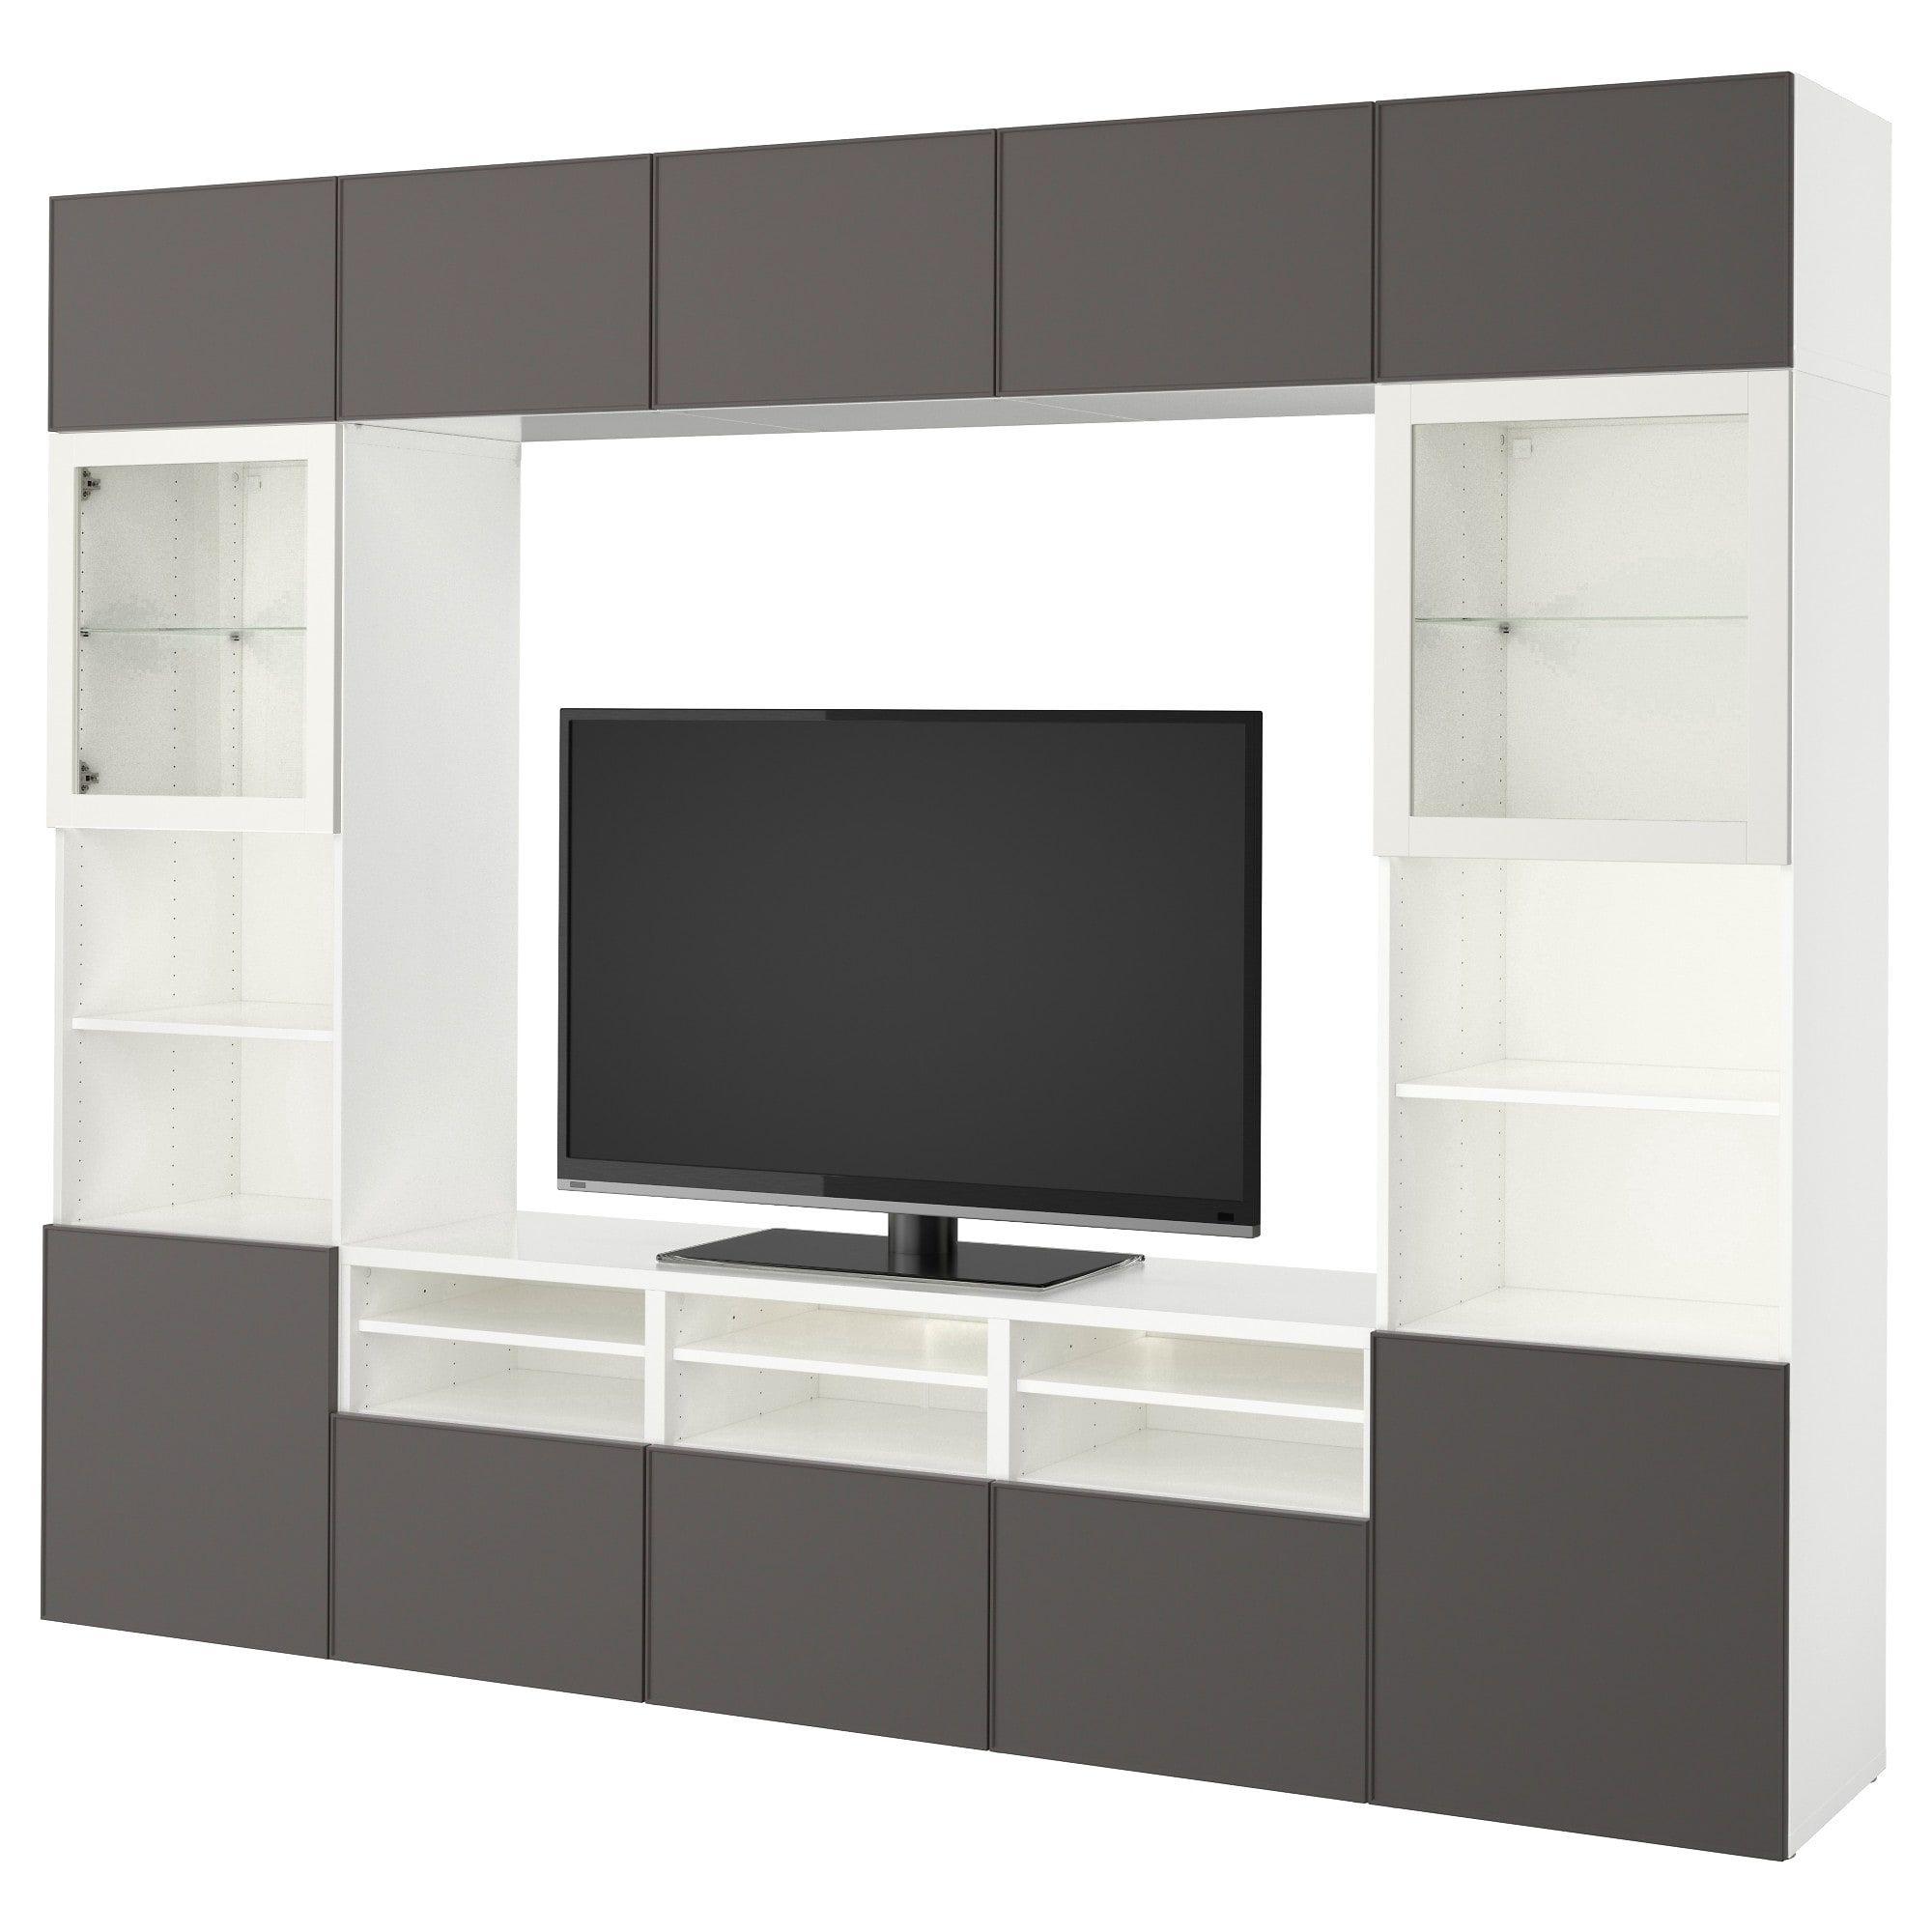 ikea best tv storage combination glass doors white. Black Bedroom Furniture Sets. Home Design Ideas